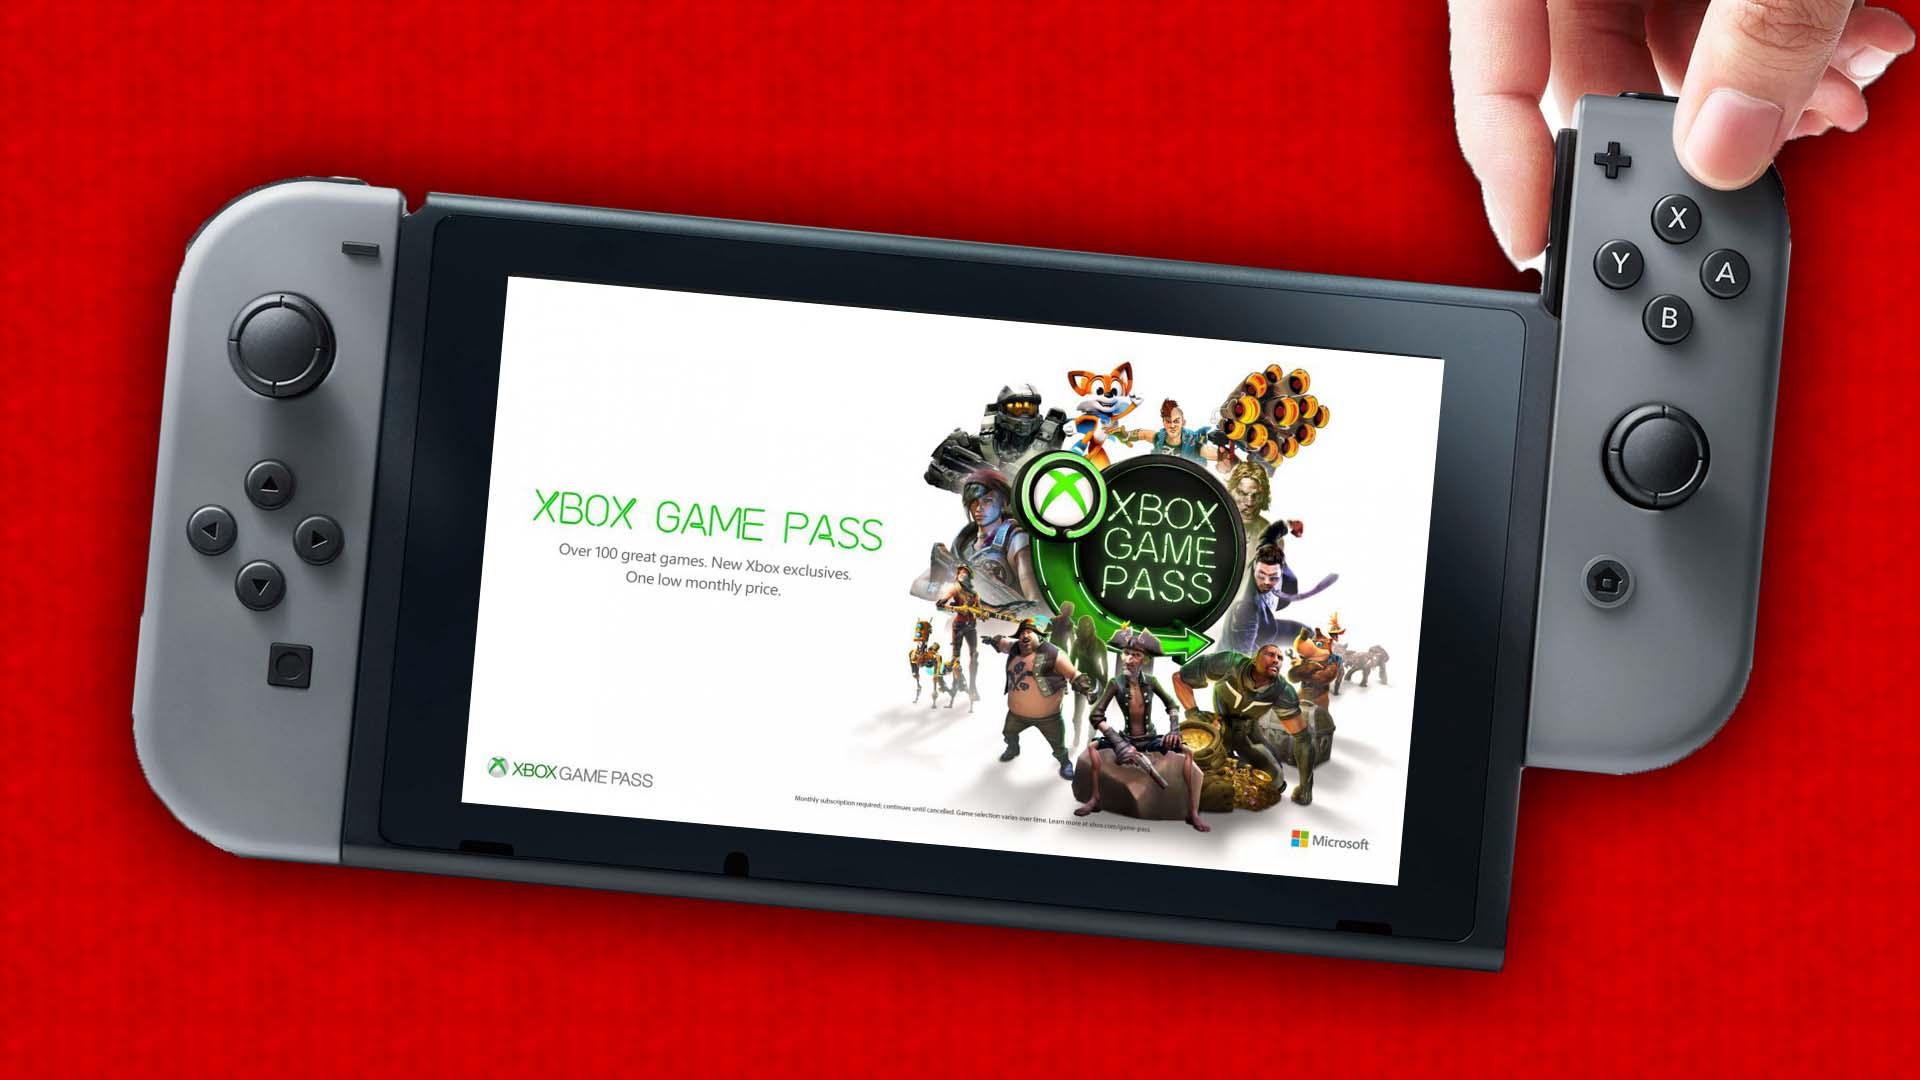 Multiples fuentes aseguran que Game Pass no llegará a Switch